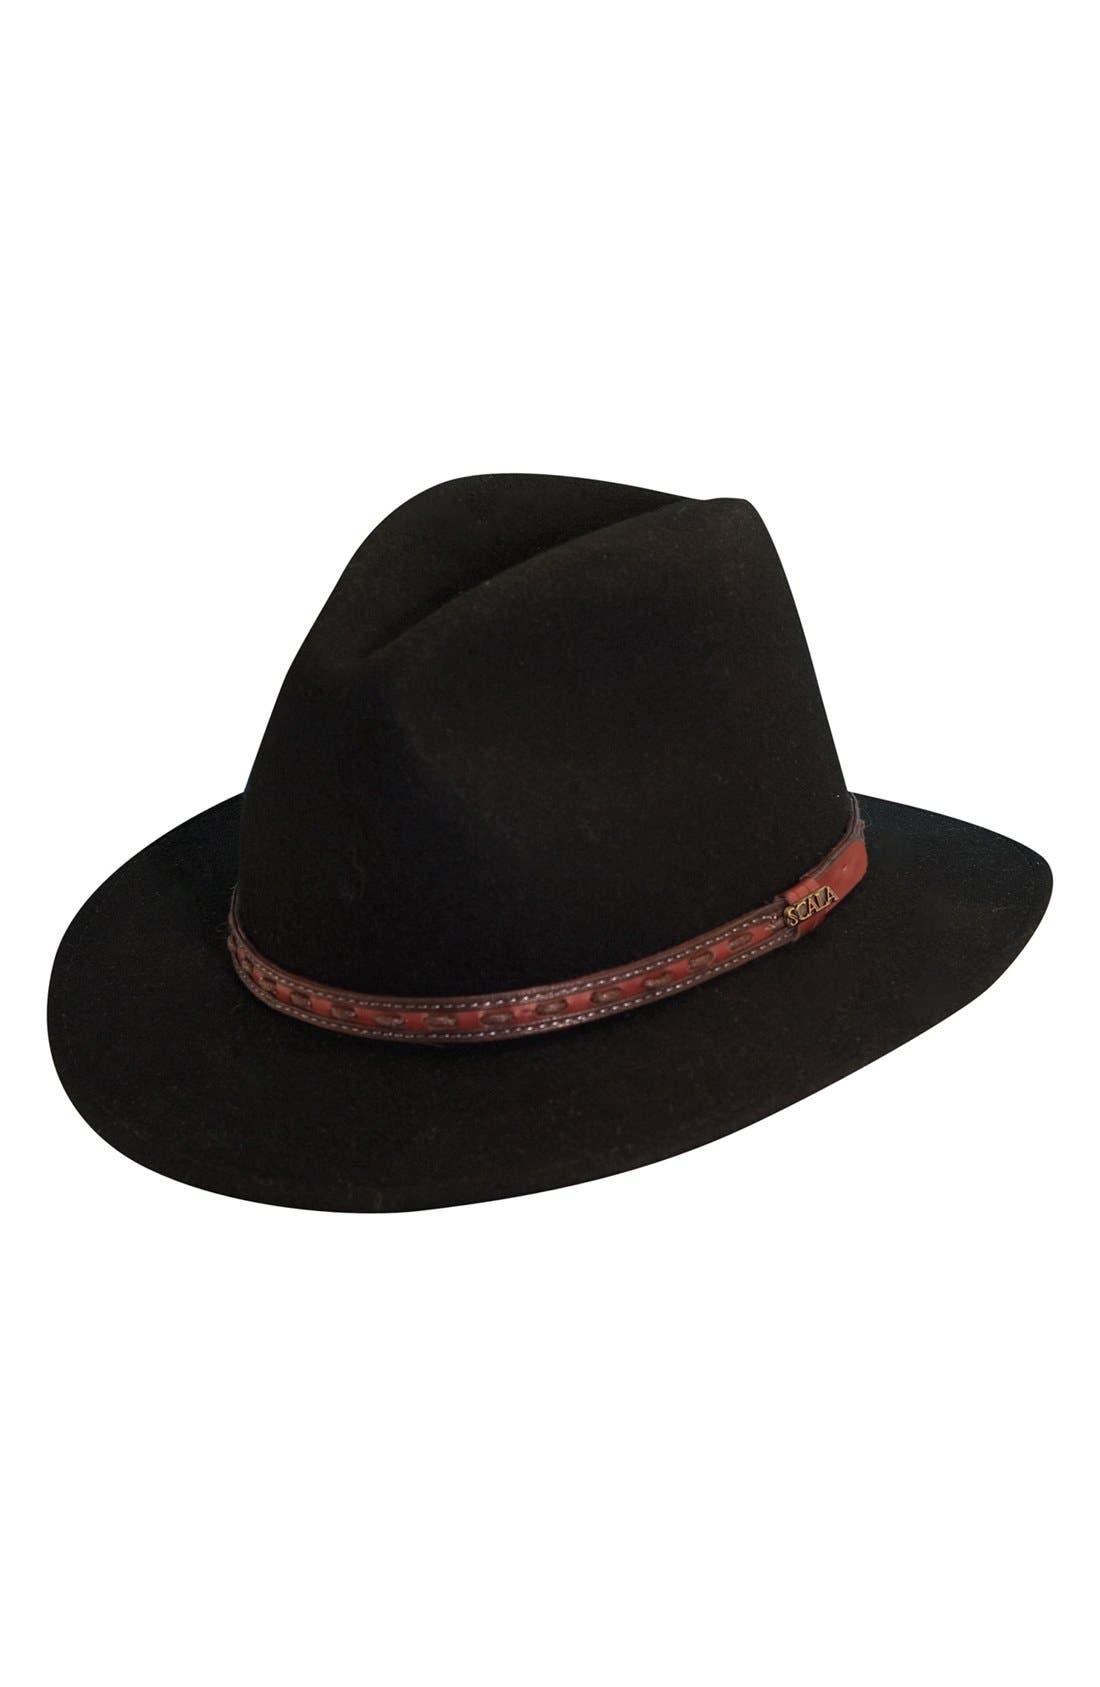 1960s – 70s Style Men's Hats Mens Scala Classico Crushable Felt Safari Hat - Black $53.00 AT vintagedancer.com